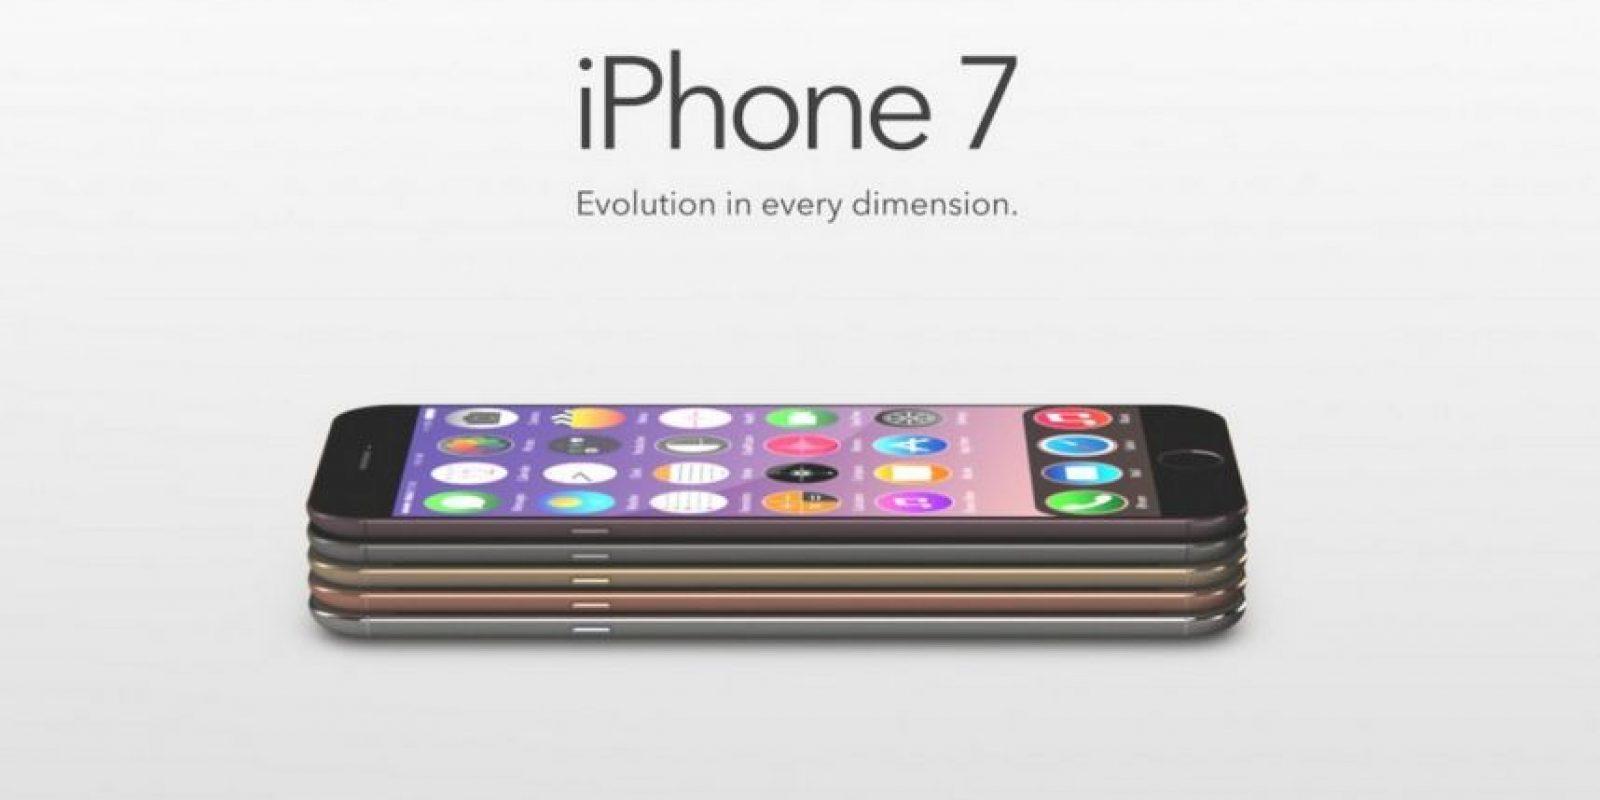 iPhone 7, el nombre tentativo del próximo smartphone de Apple. Foto:Tumblr